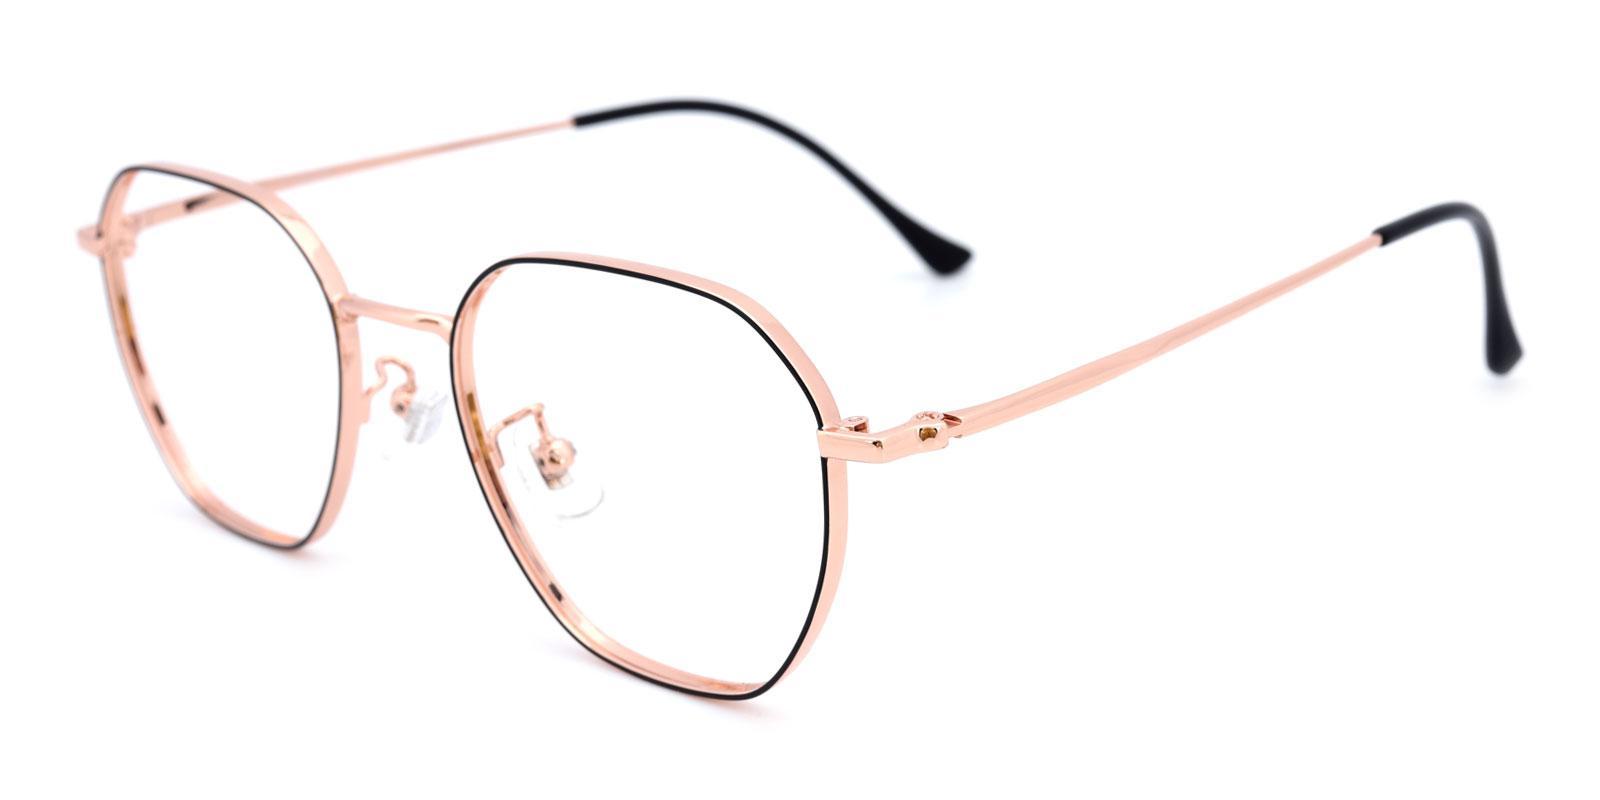 Kyle-Gold-Geometric-Titanium-Eyeglasses-detail